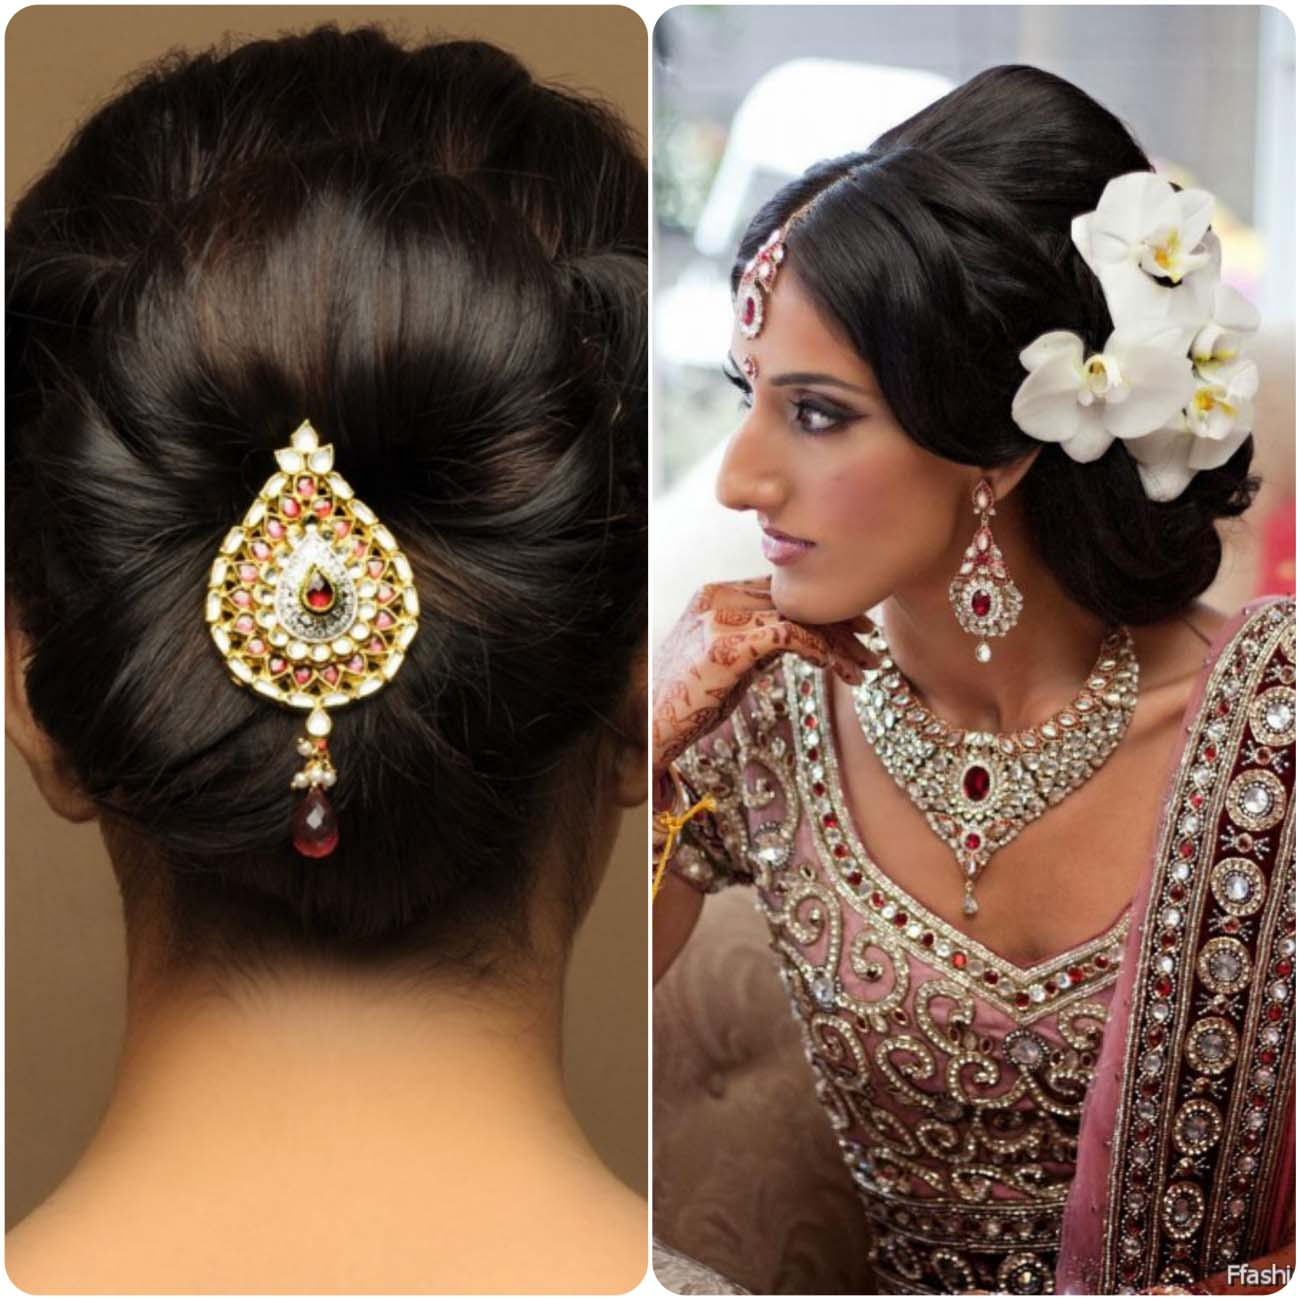 Women Fashion Girls Dress: Indian native Wedding Hair ...